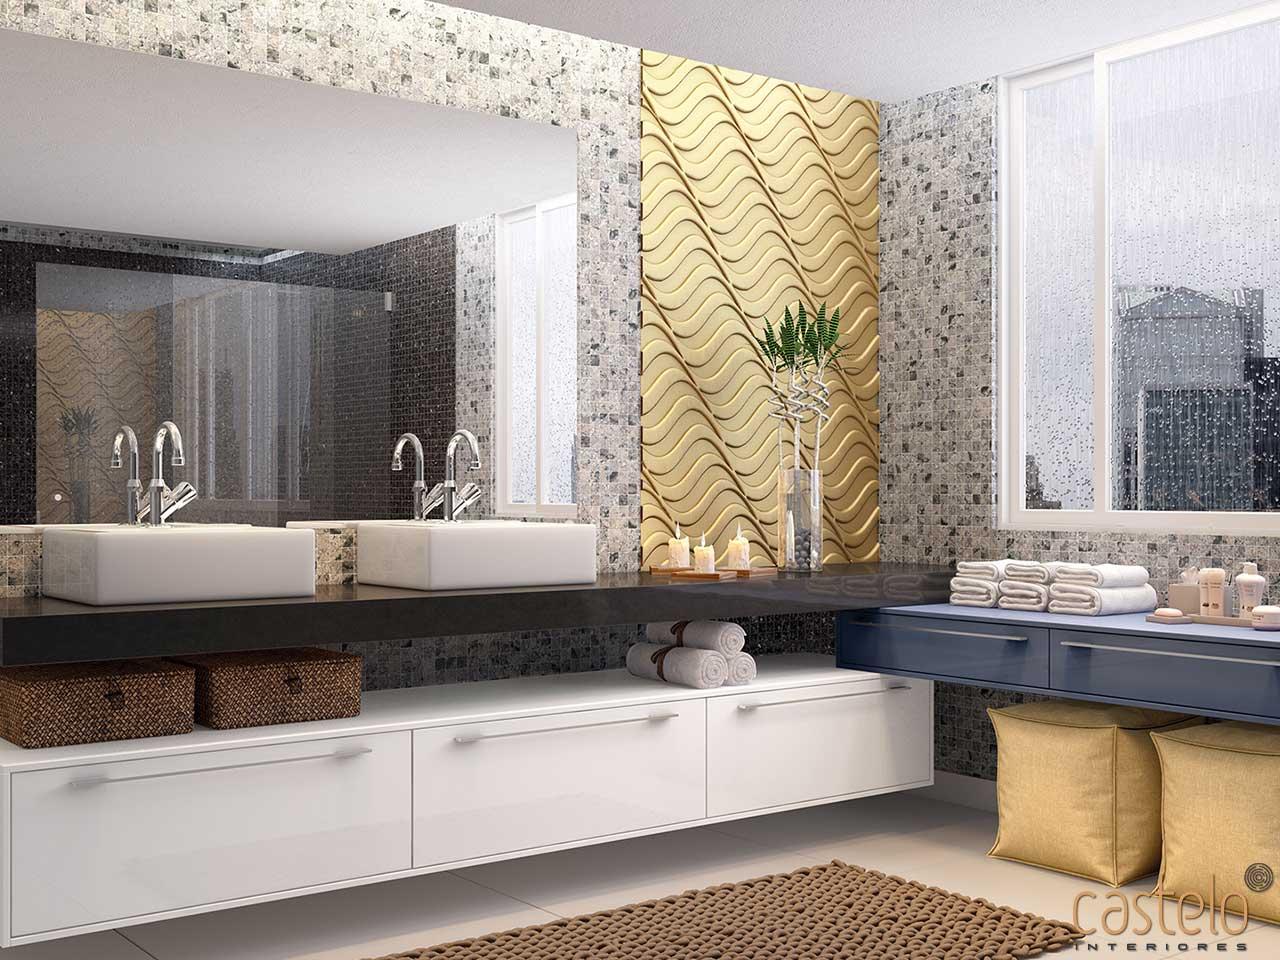 castelo-interiores-banheiro1